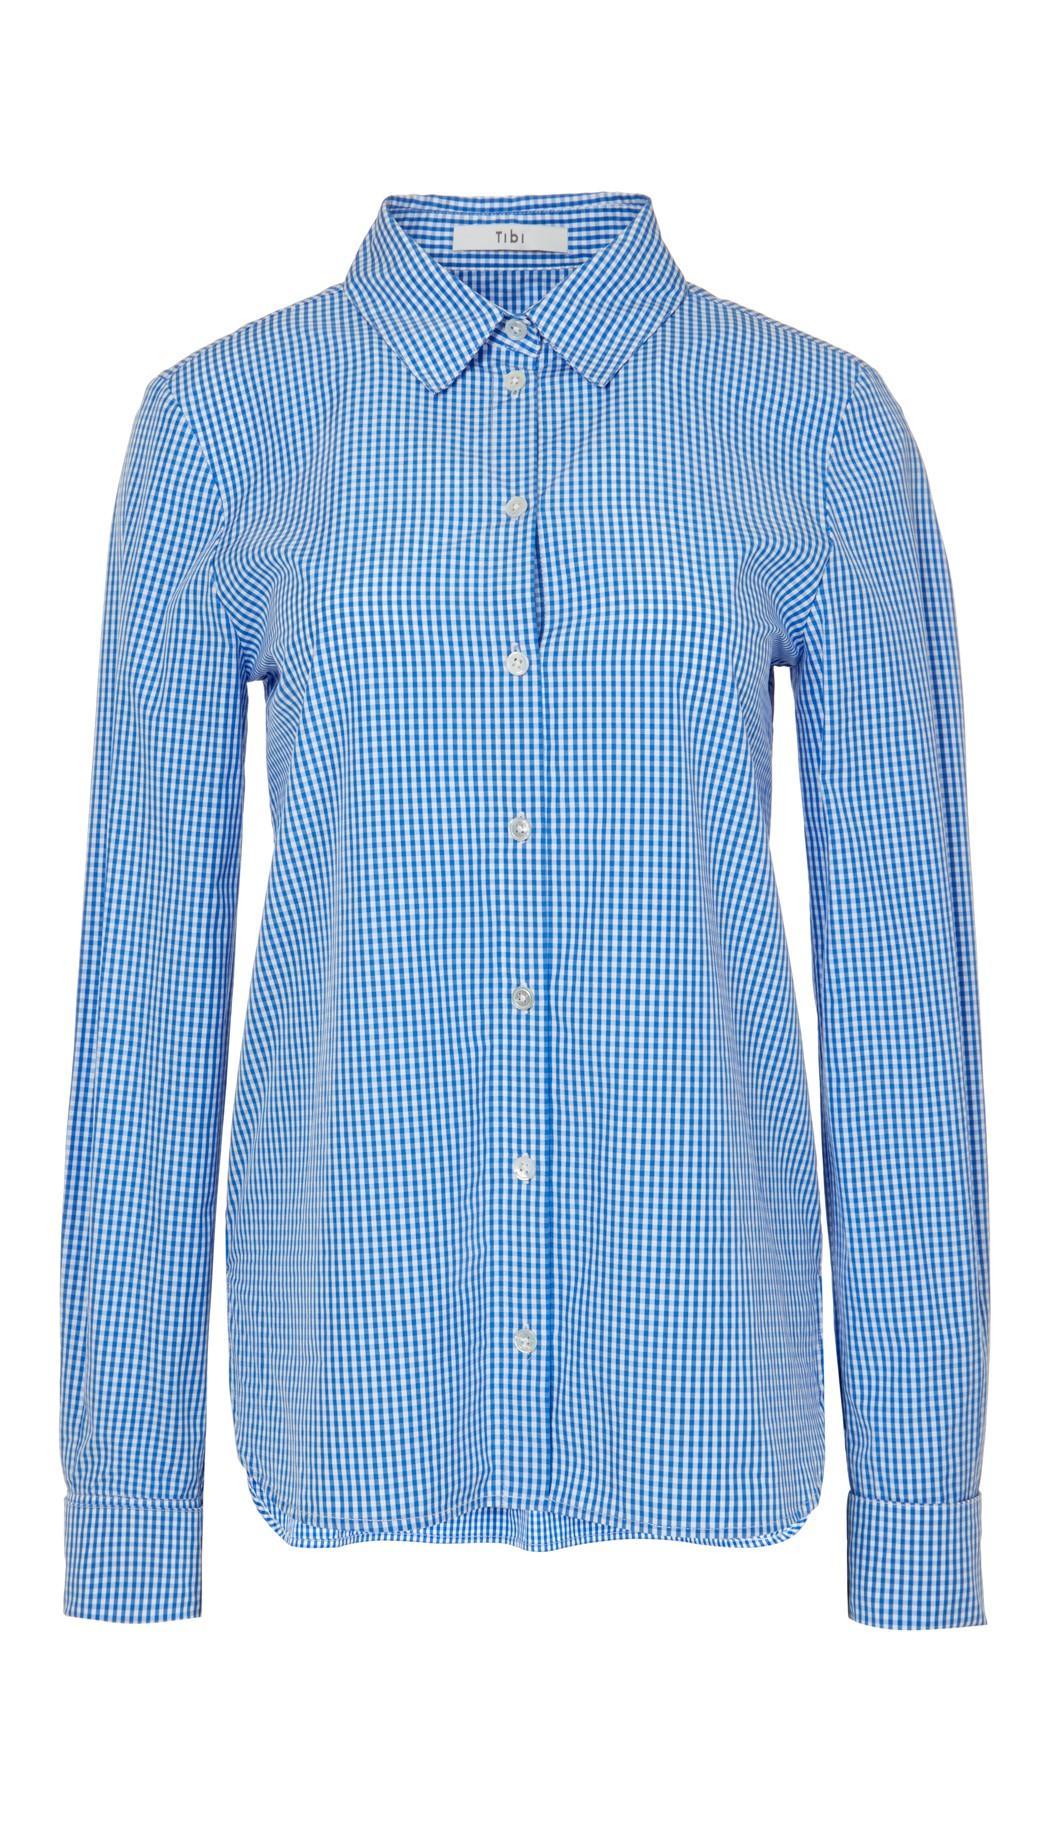 Tibi Slim-Fit Gingham Shirt, Blue/White In Blue Pattern